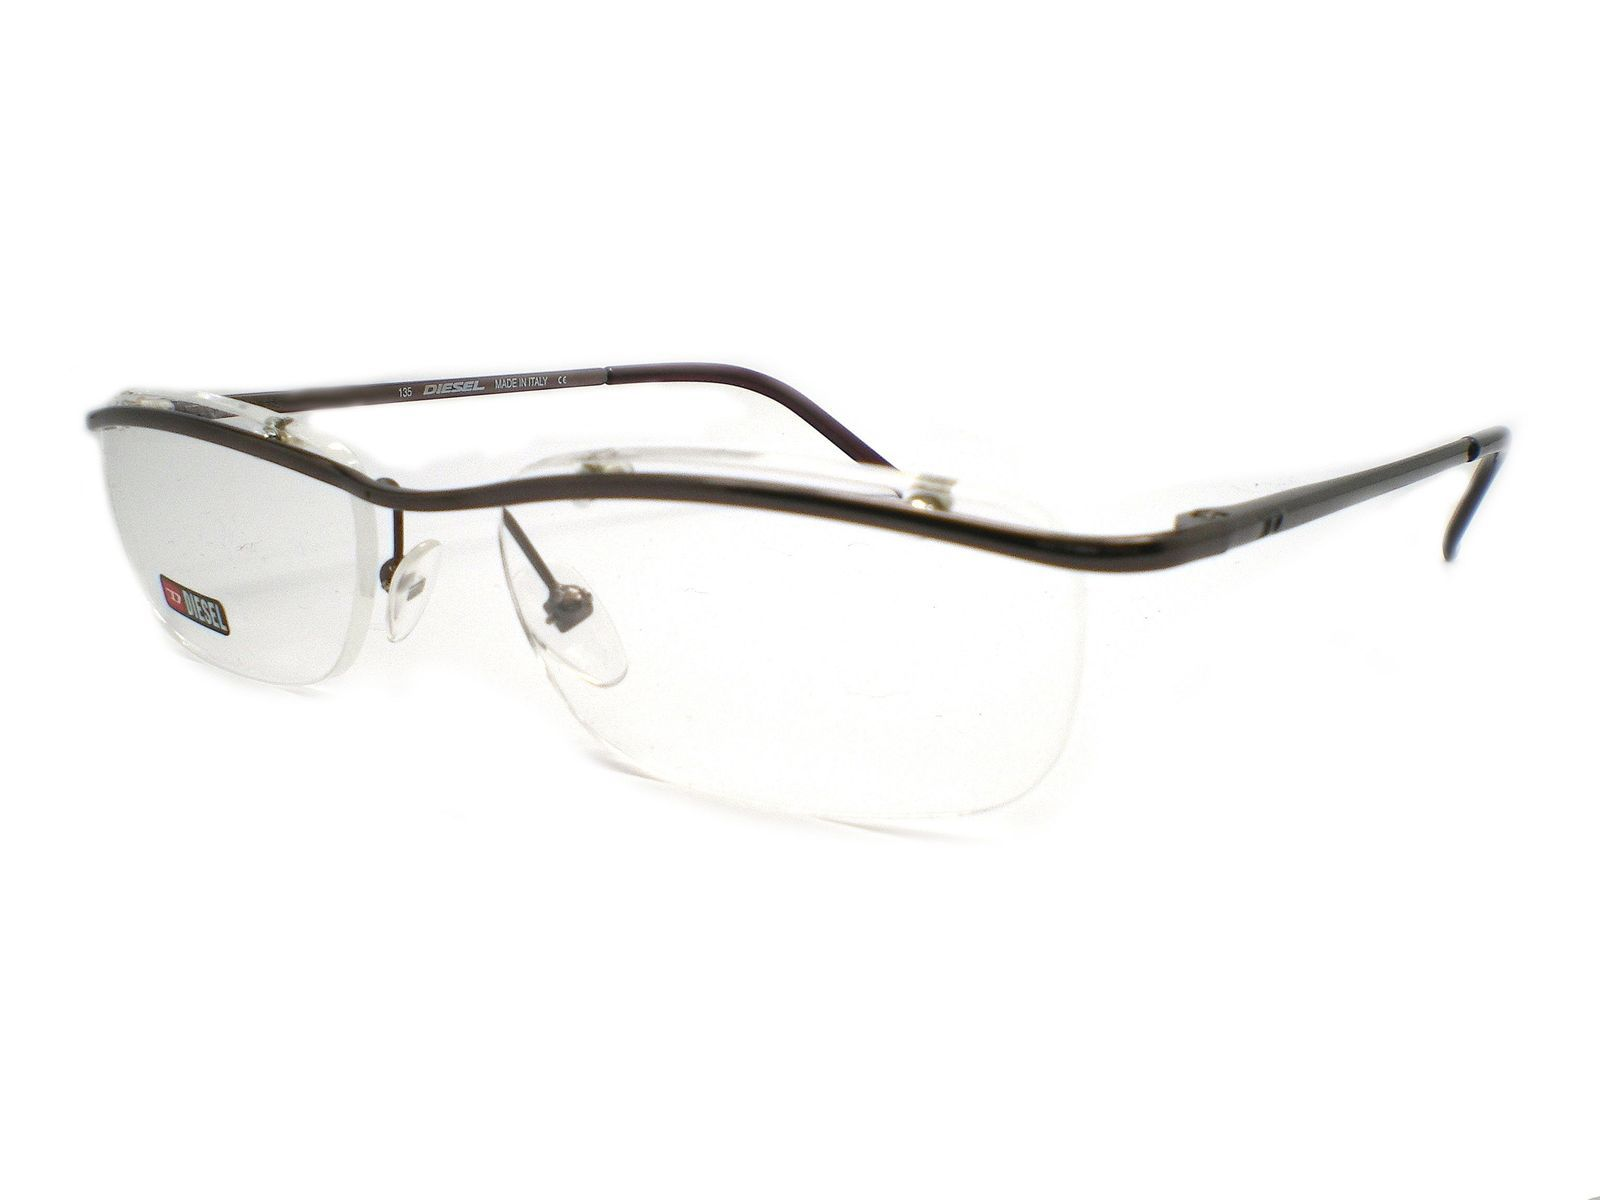 Elegant Men Eyewear glasses frames - Look good like a professional ...